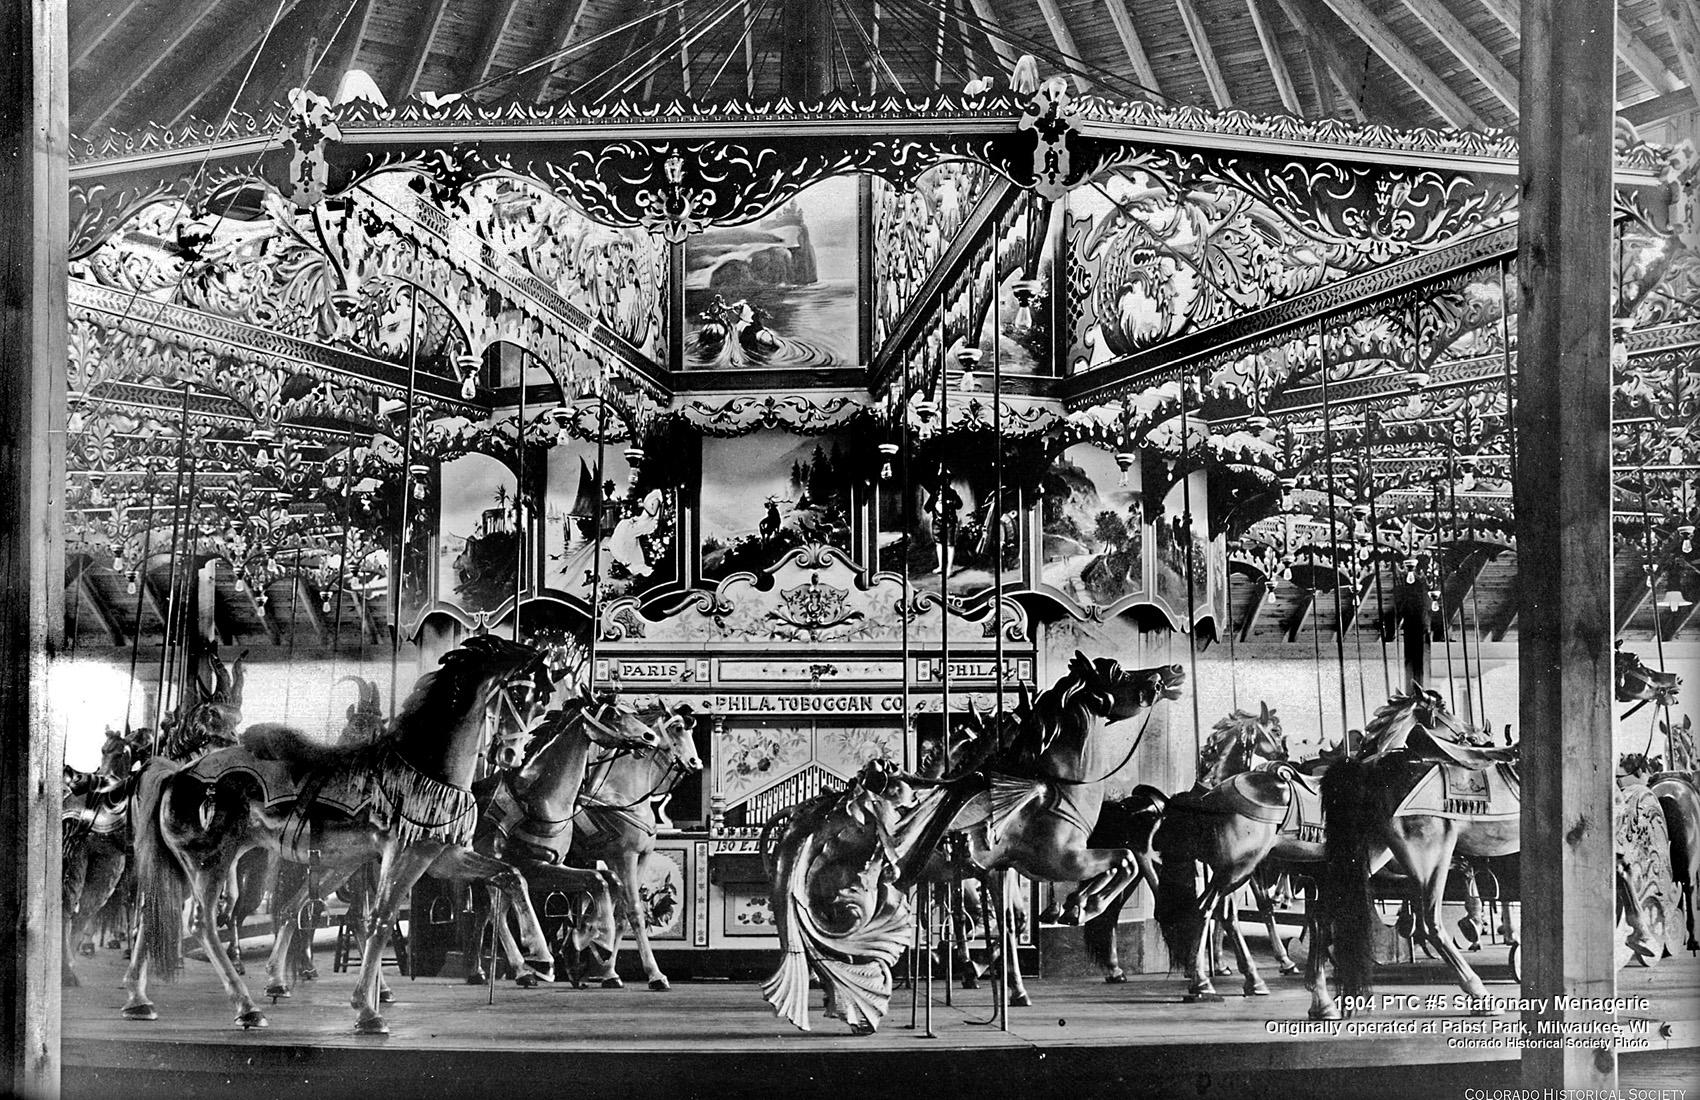 1904-historic-carousel-PTC-5-Pabst-Park-Milwaukee-WI-CNT_JUN_10